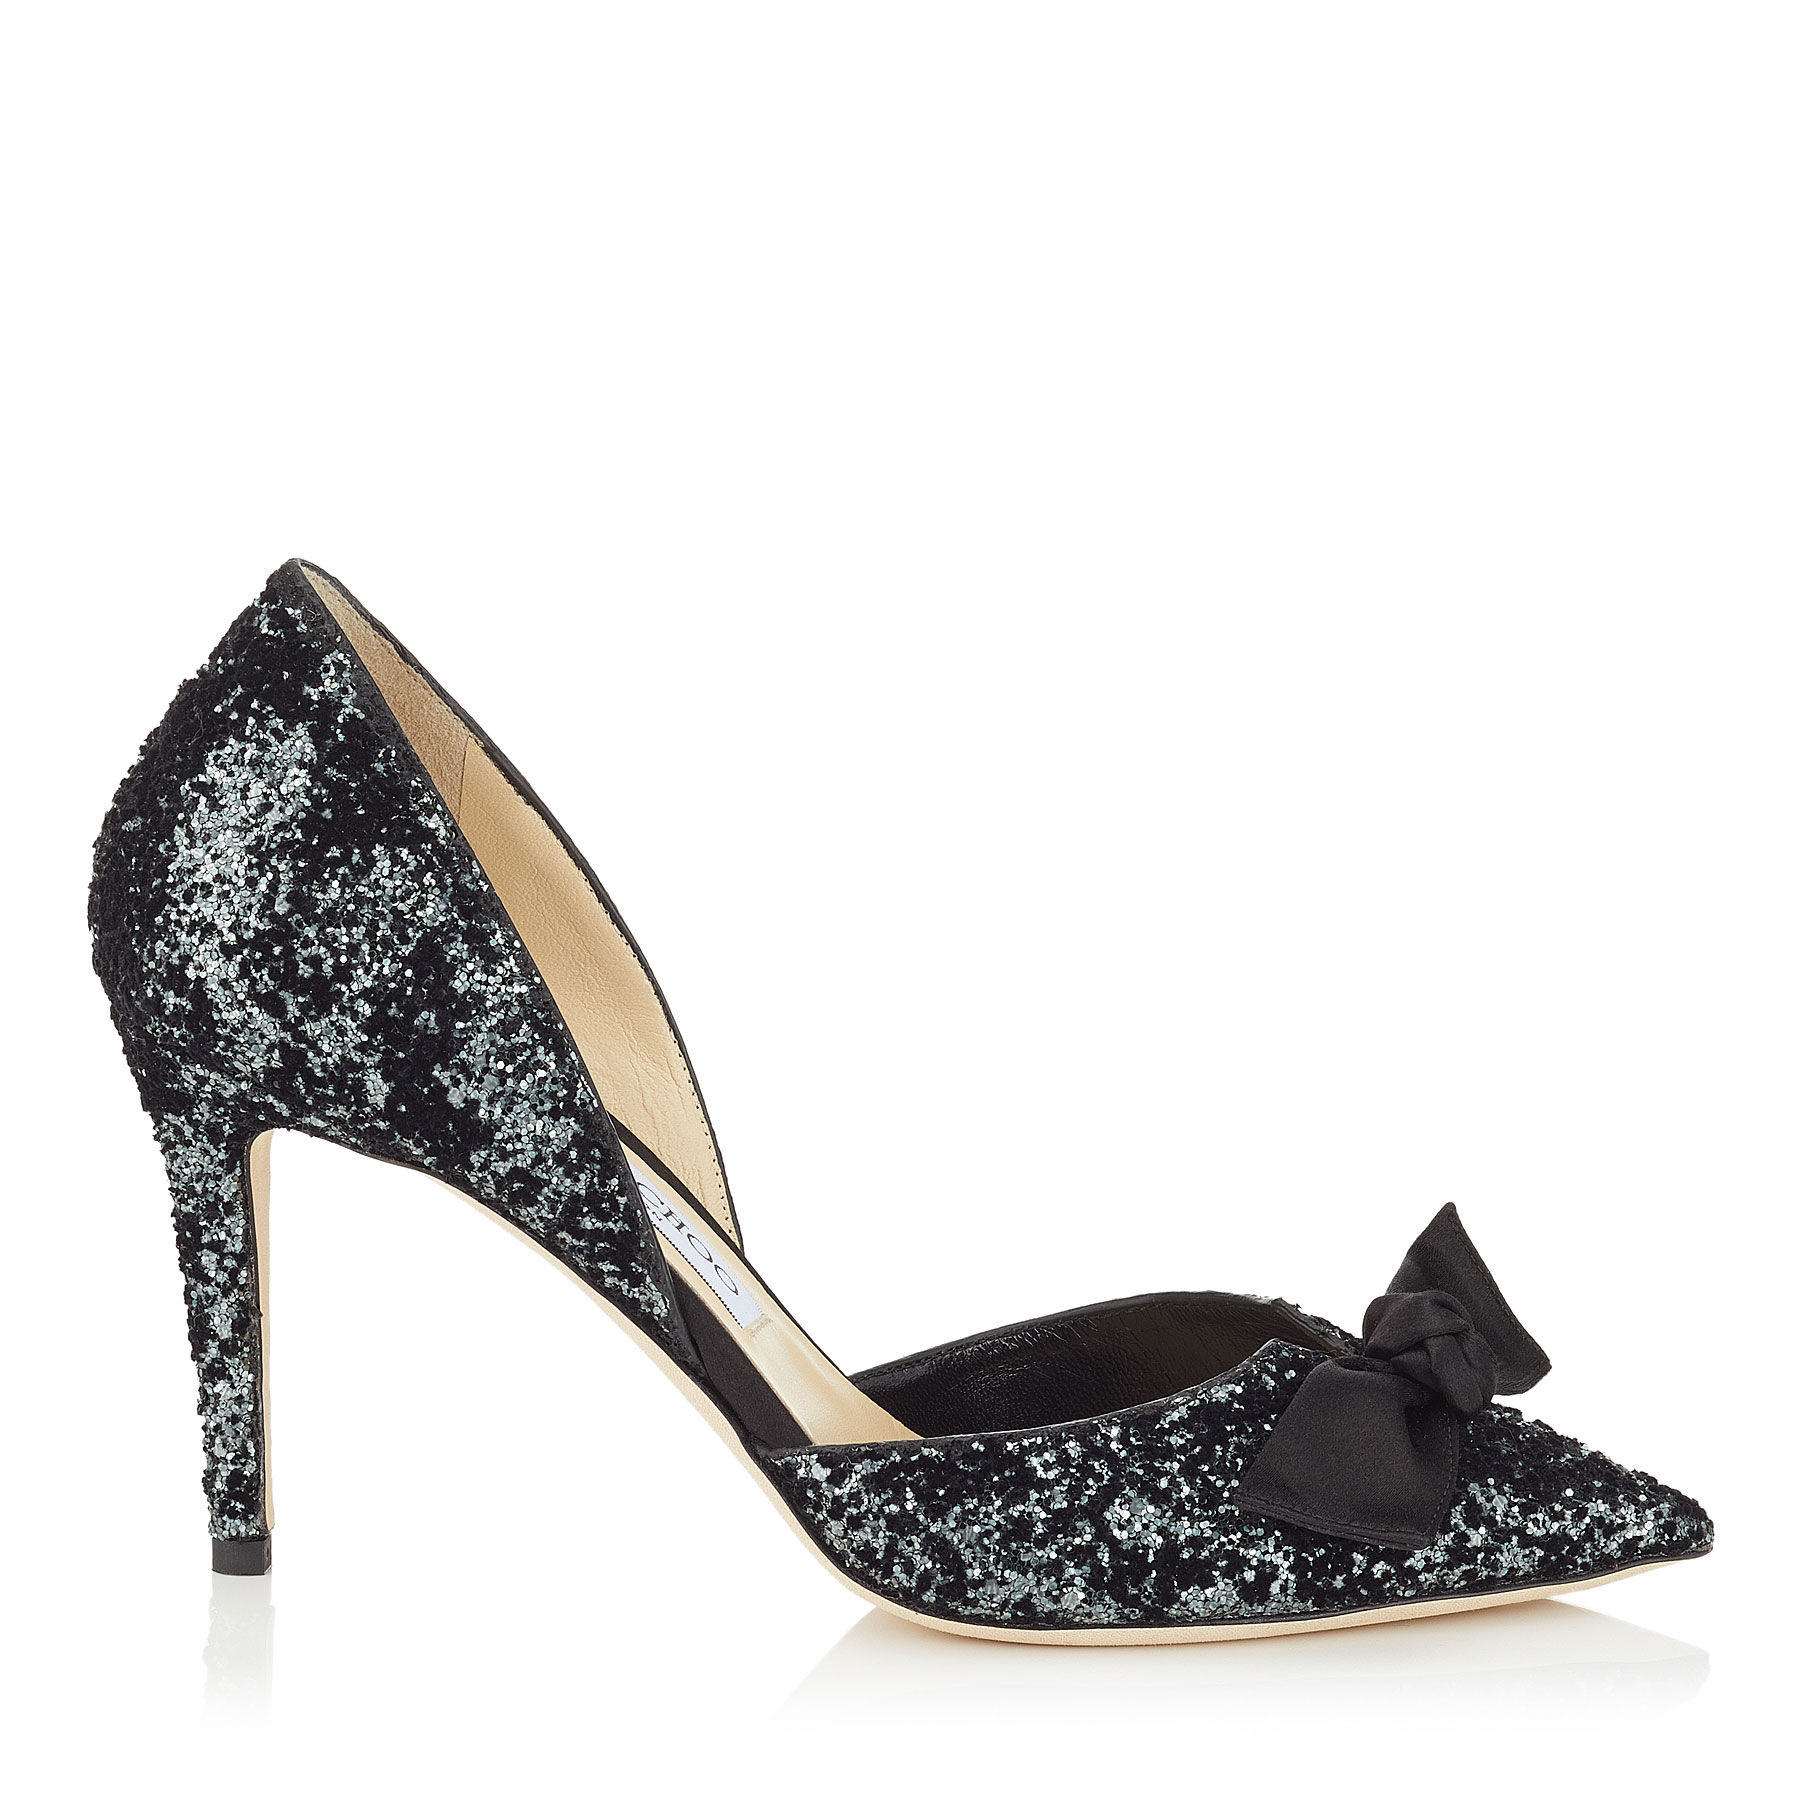 1800x1800 Anthracite Velvet Glitter And Black Satin Pointy Toe Pumps